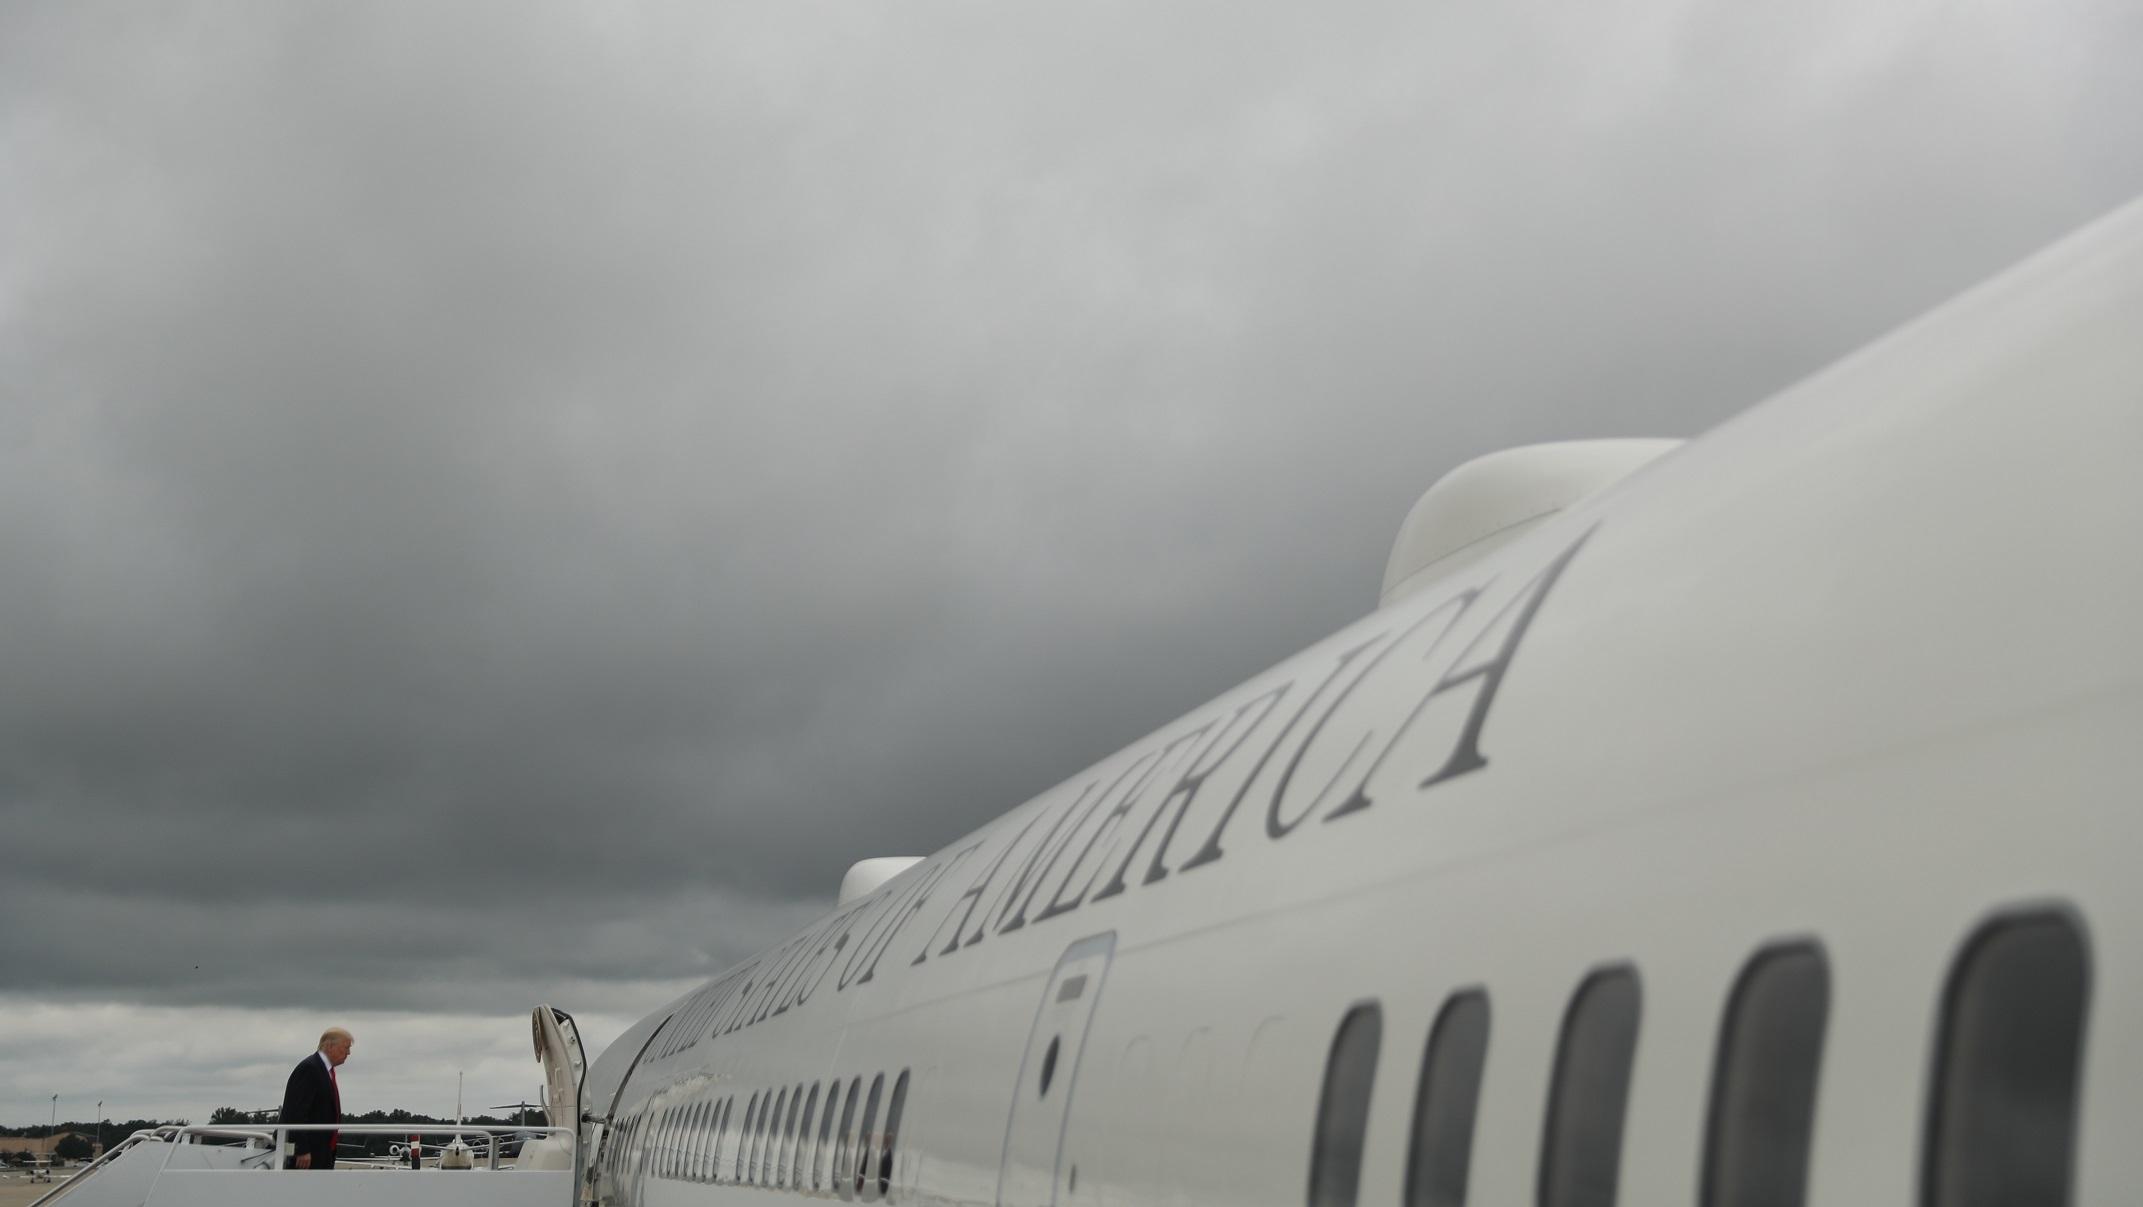 air force 1 plane donald trump